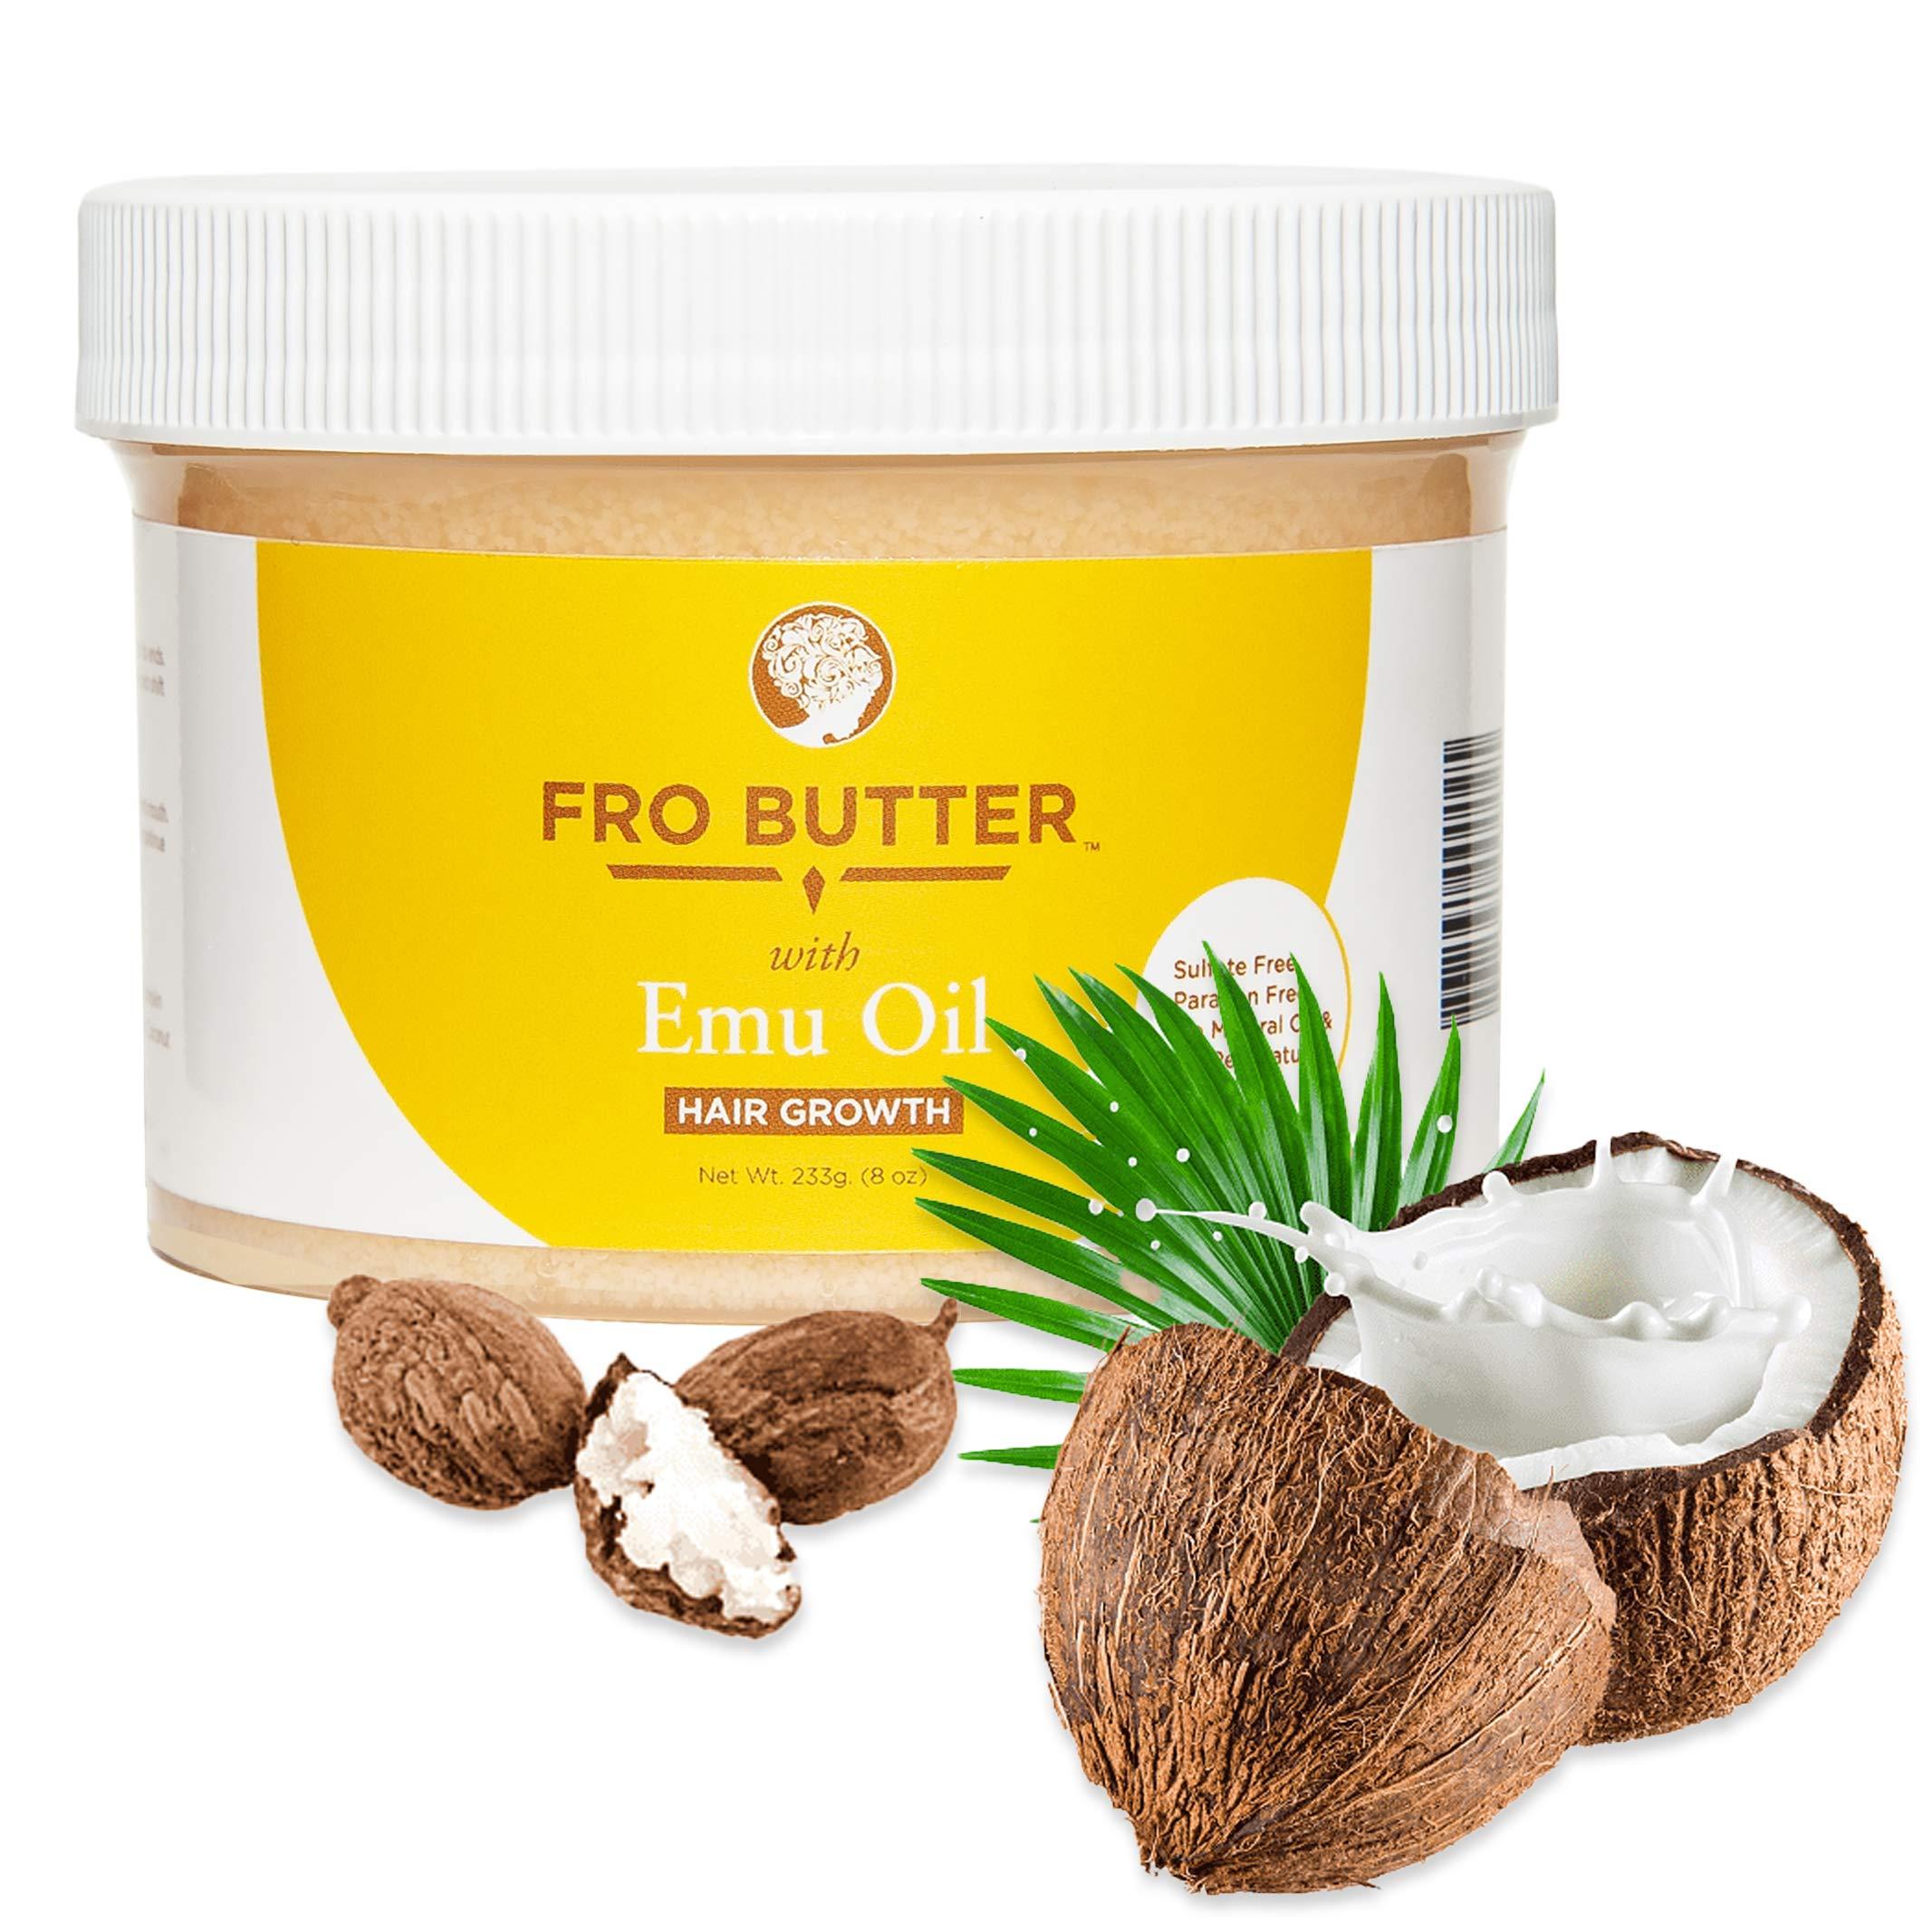 Fro Butter Emu Oil Hair Growth Treatment | Shea Butter, Virgin Coconut & Lavender Oil, Pumpkin Seeds & Nourishing Extracts | For Fast Hair Restoration, Split Ends, Damaged & Brittle Hair, Men & Women